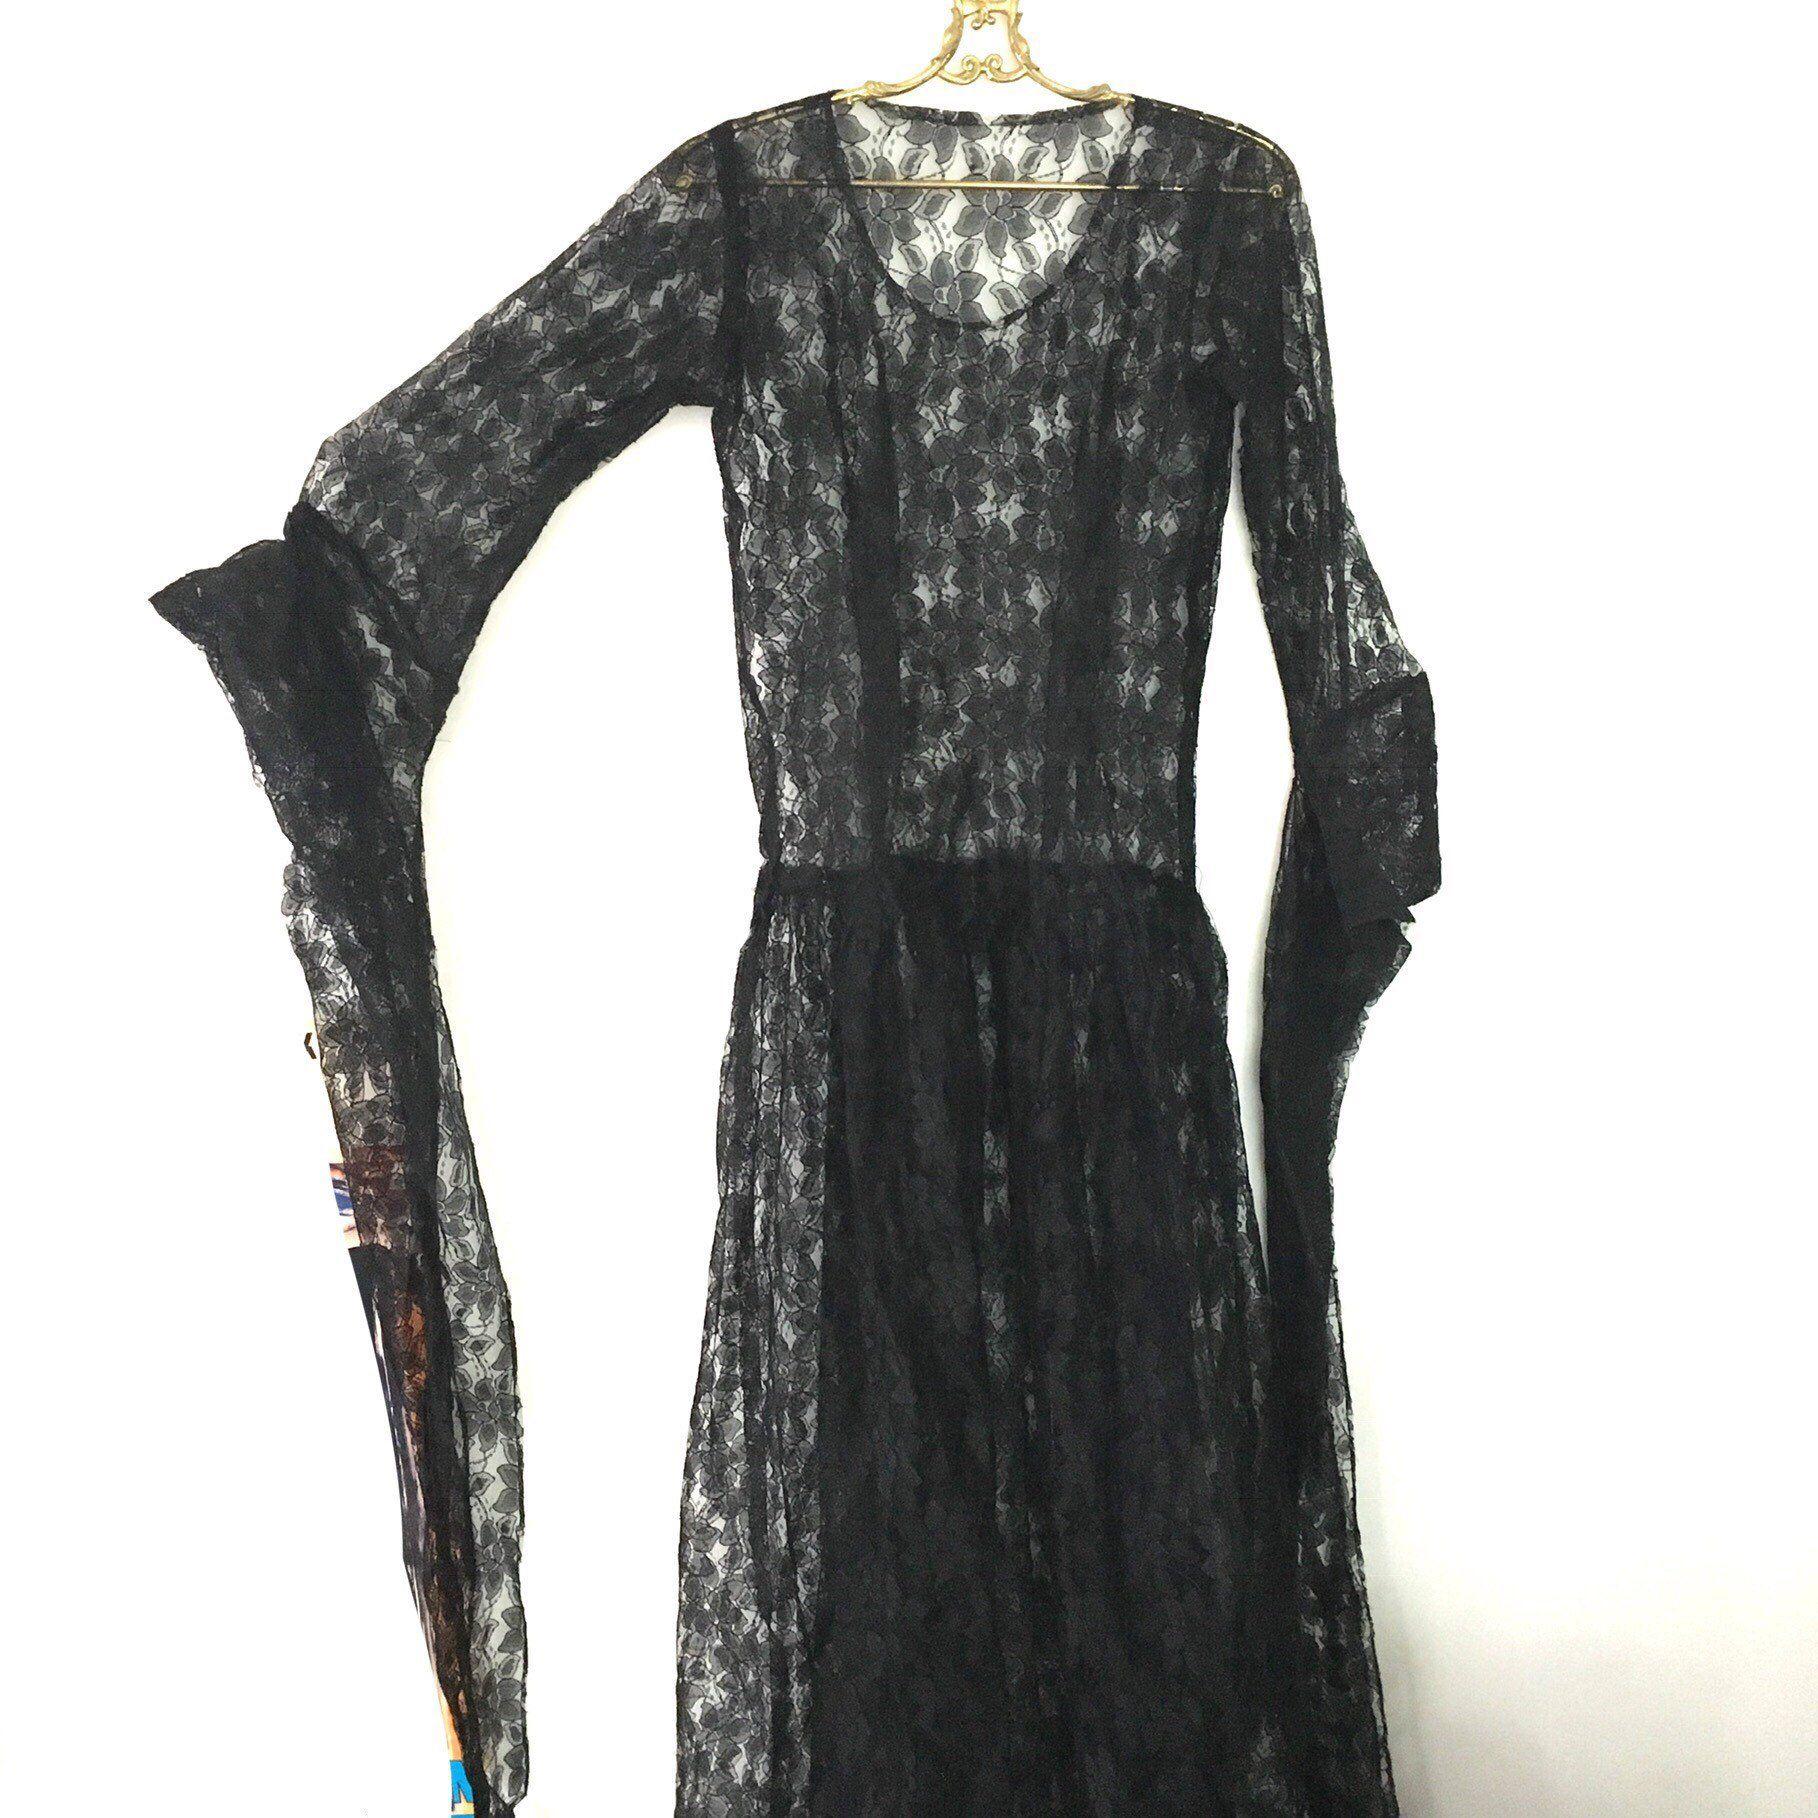 Vintage Black Lace Sorceress Dress Witchy Black Gown With Etsy Vintage Black Lace Dress Dresses Black Lace [ 1818 x 1818 Pixel ]